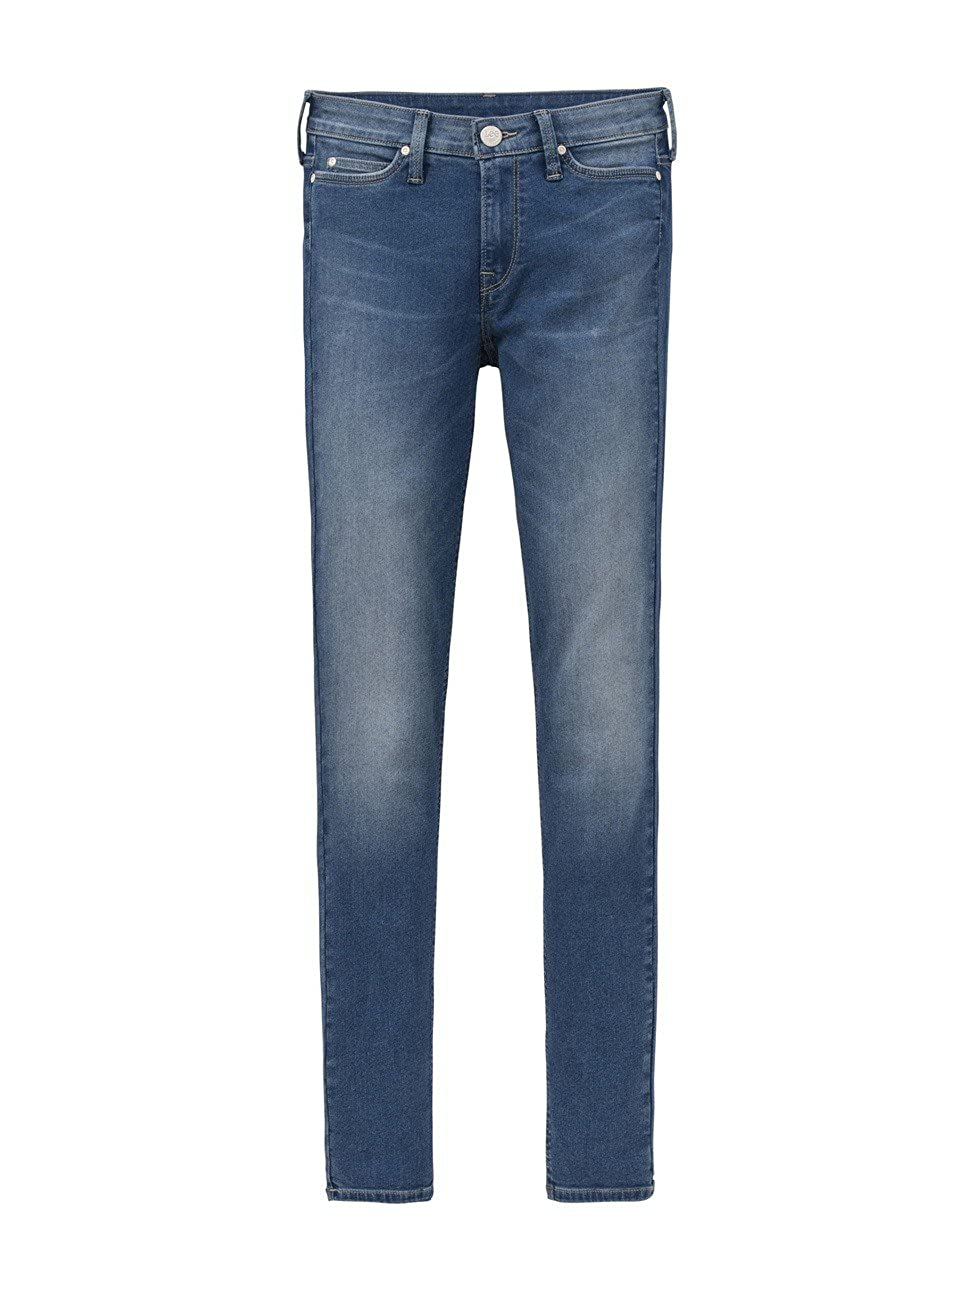 TALLA 26W / 31L. Lee Skyler, Jeans Mujer